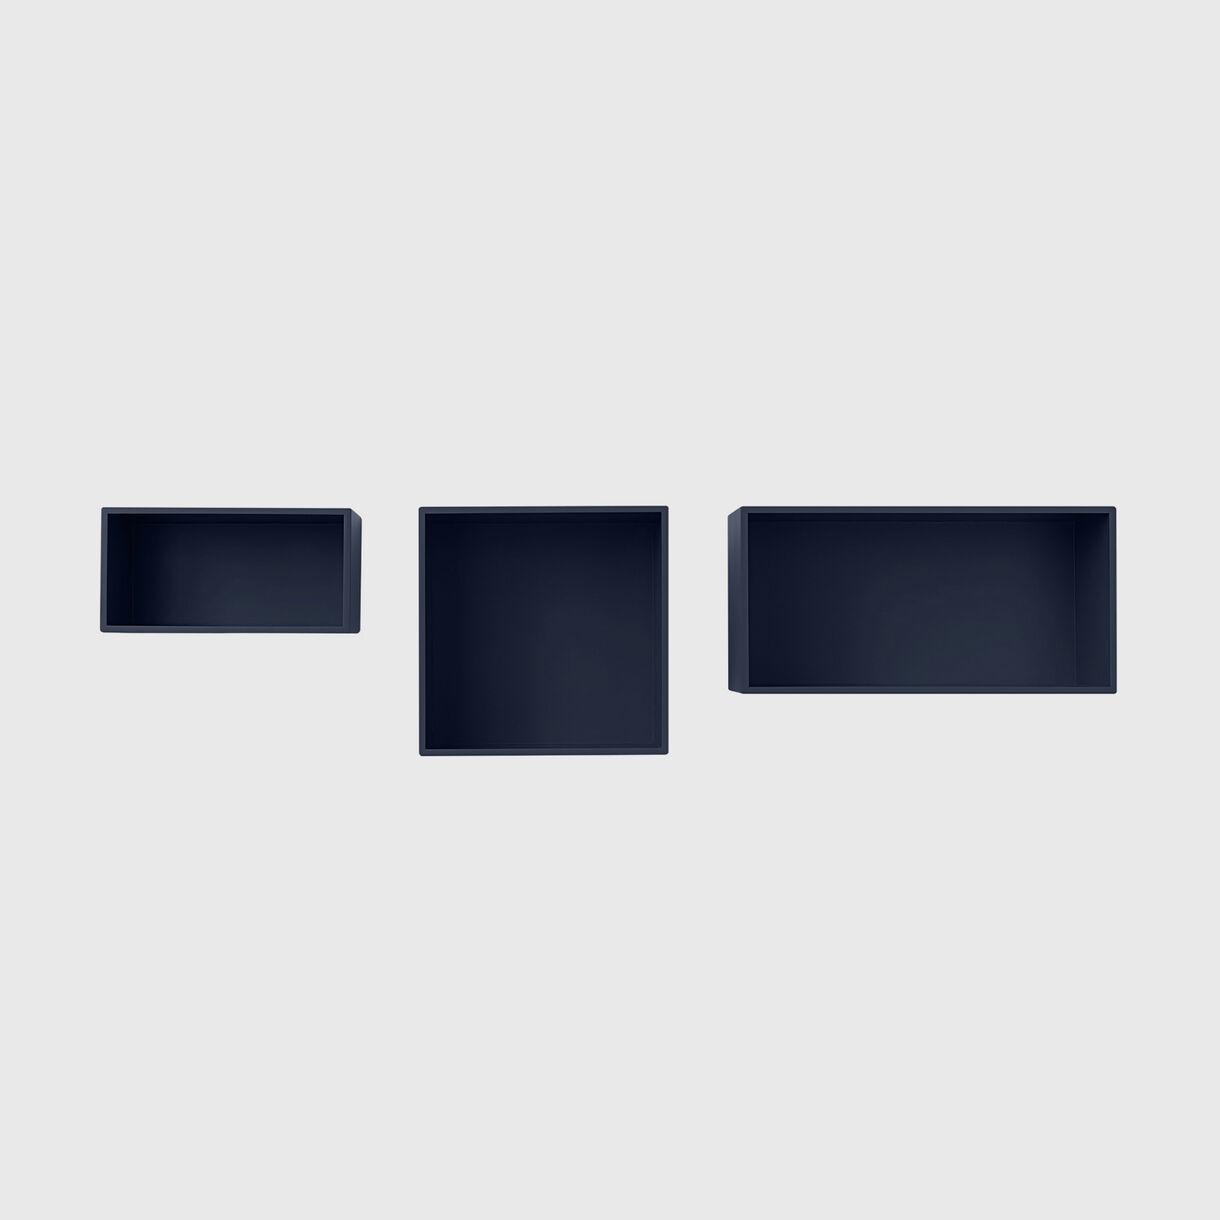 Mini Stacked Storage System 2.0, Midnight Blue